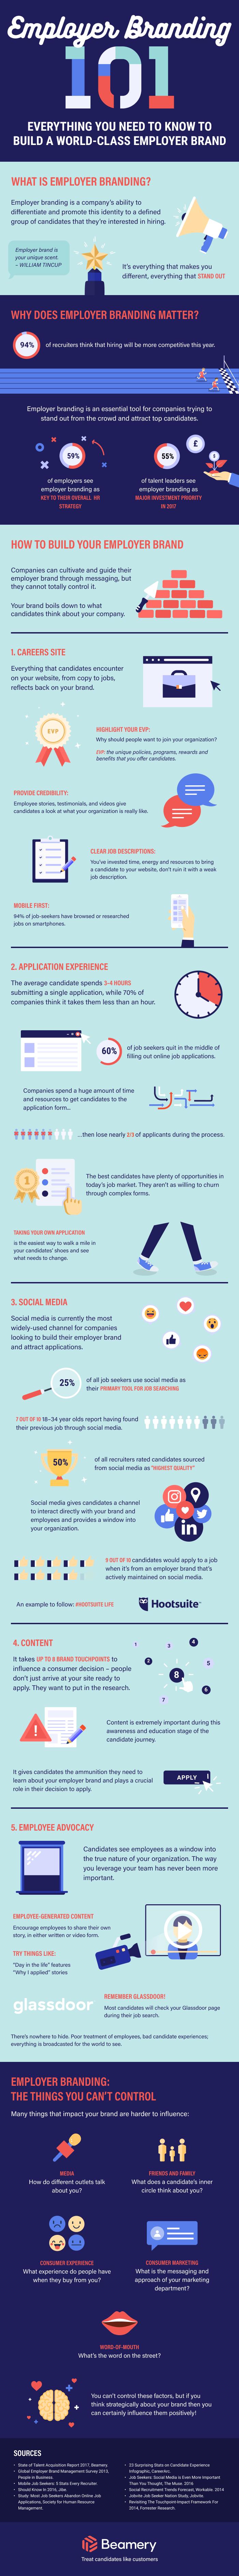 employer-branding-strategy-infographic